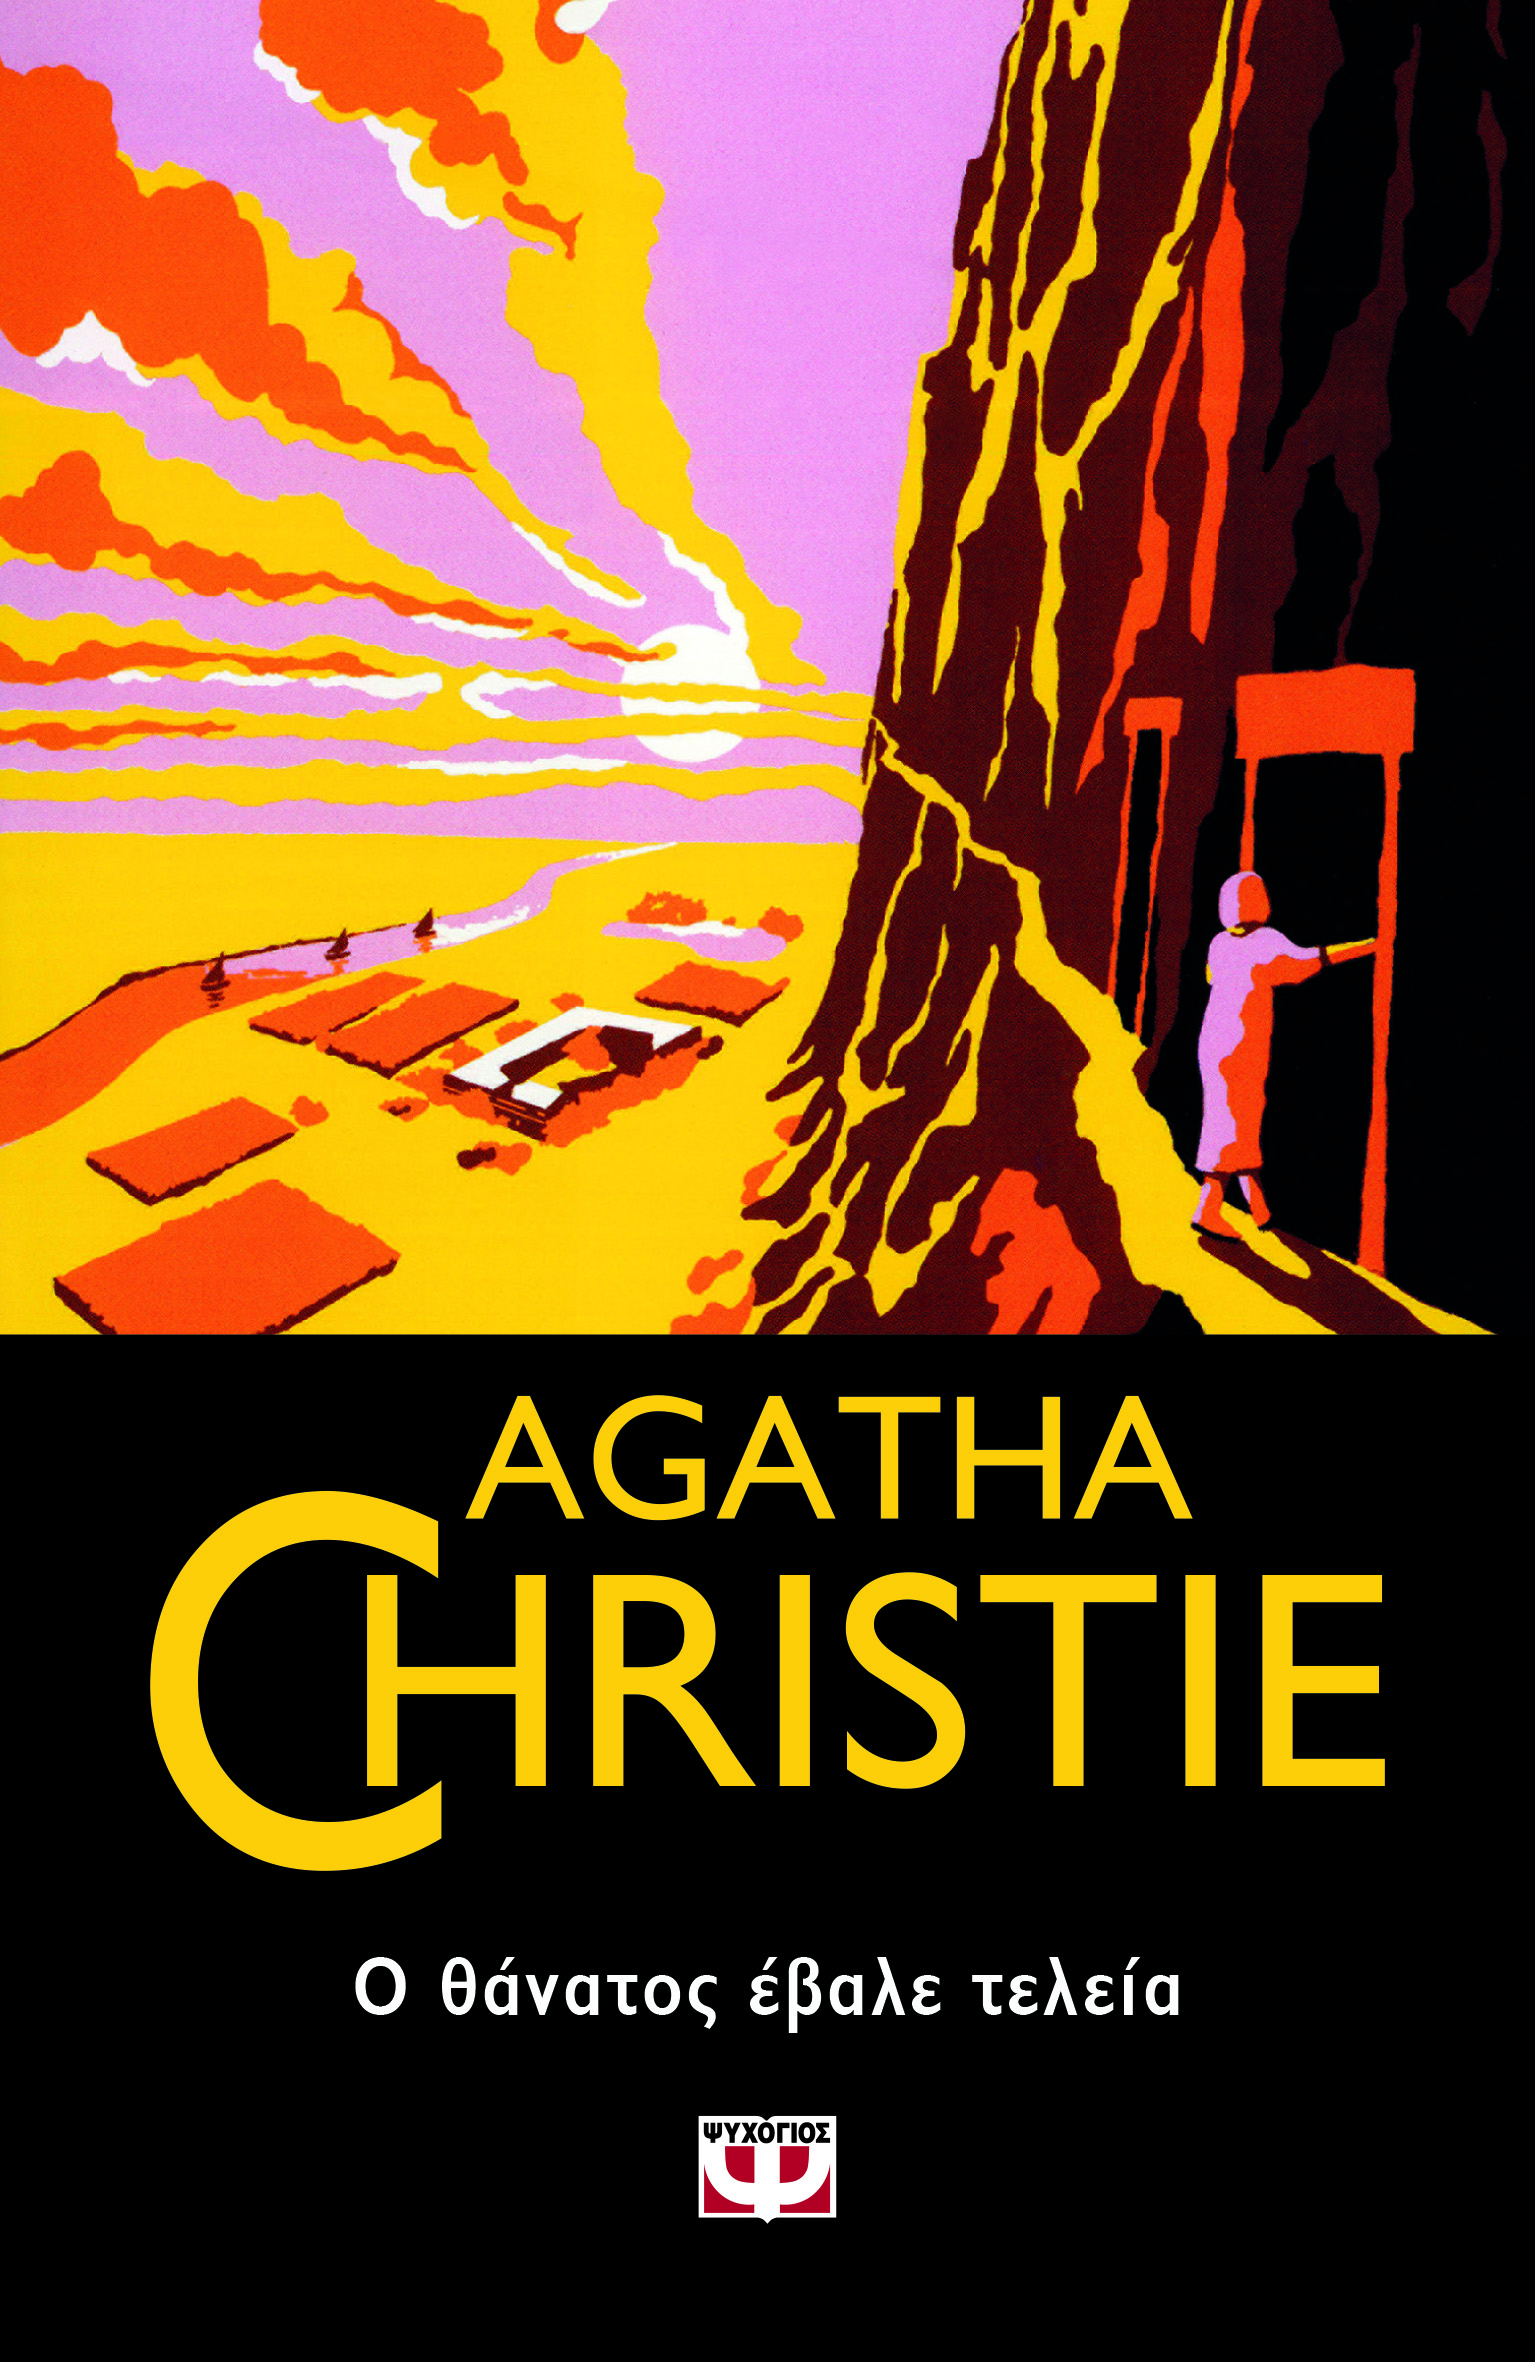 AGATHA CHRISTIE 58:Ο ΘΑΝΑΤΟΣ ΕΒΑΛΕ ΤΕΛΕΙΑ